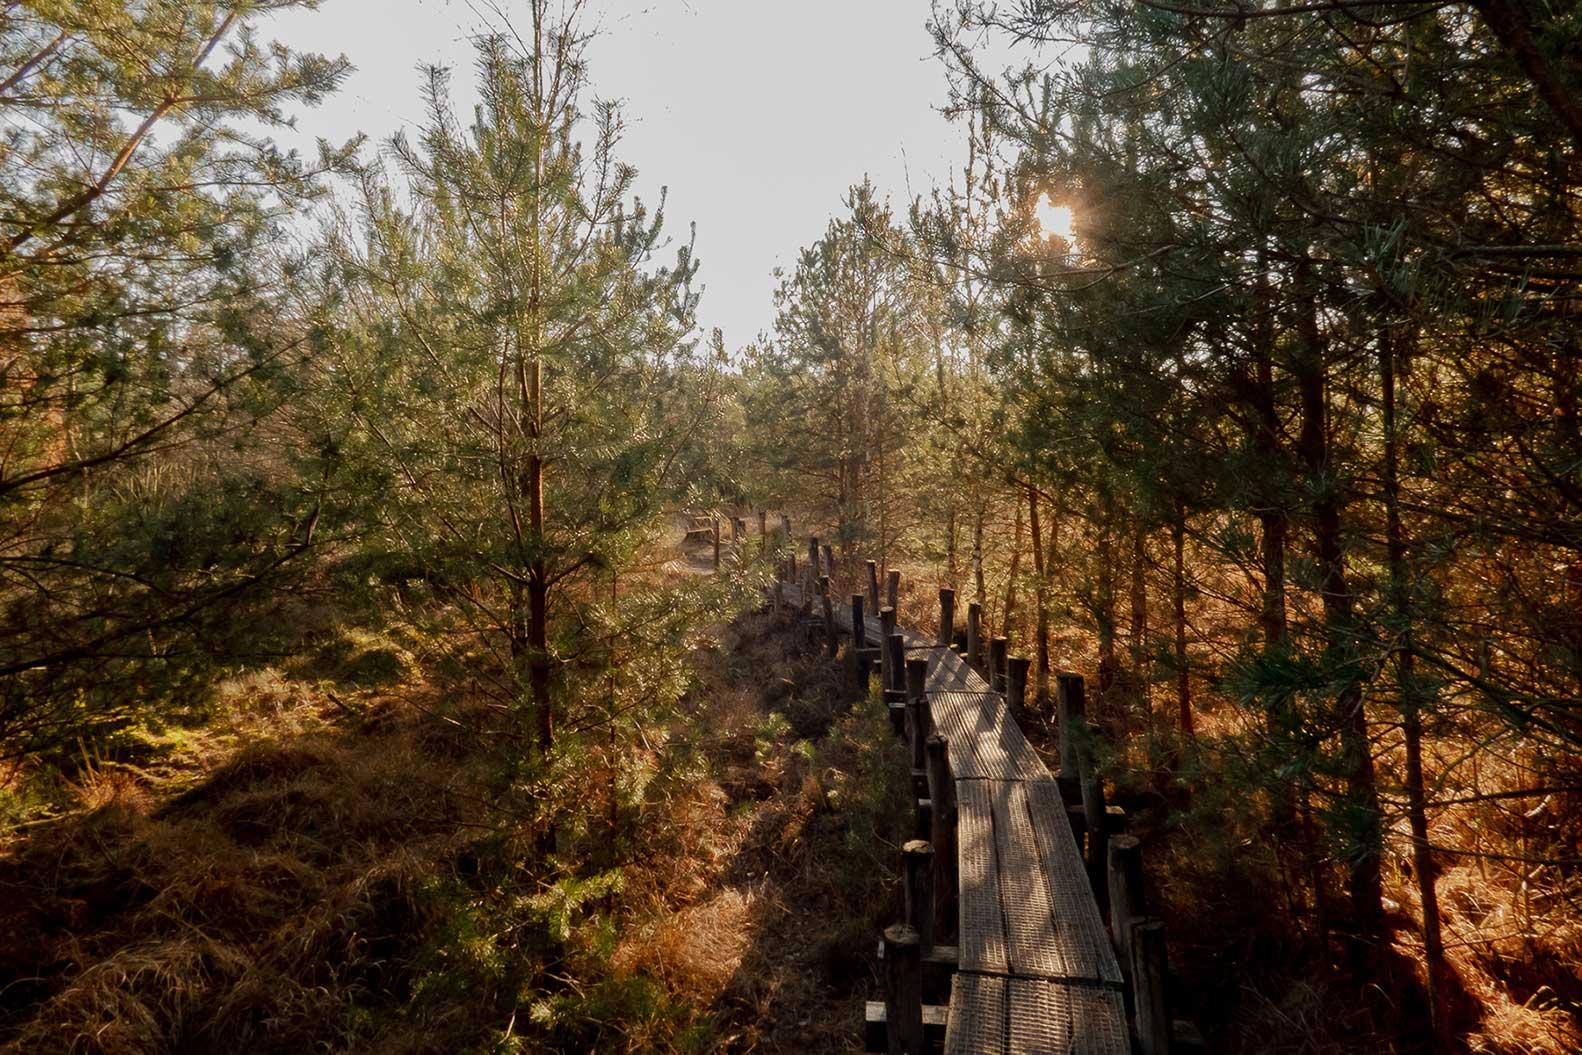 dwingelderveld-nationaal-park-spier-wandelen